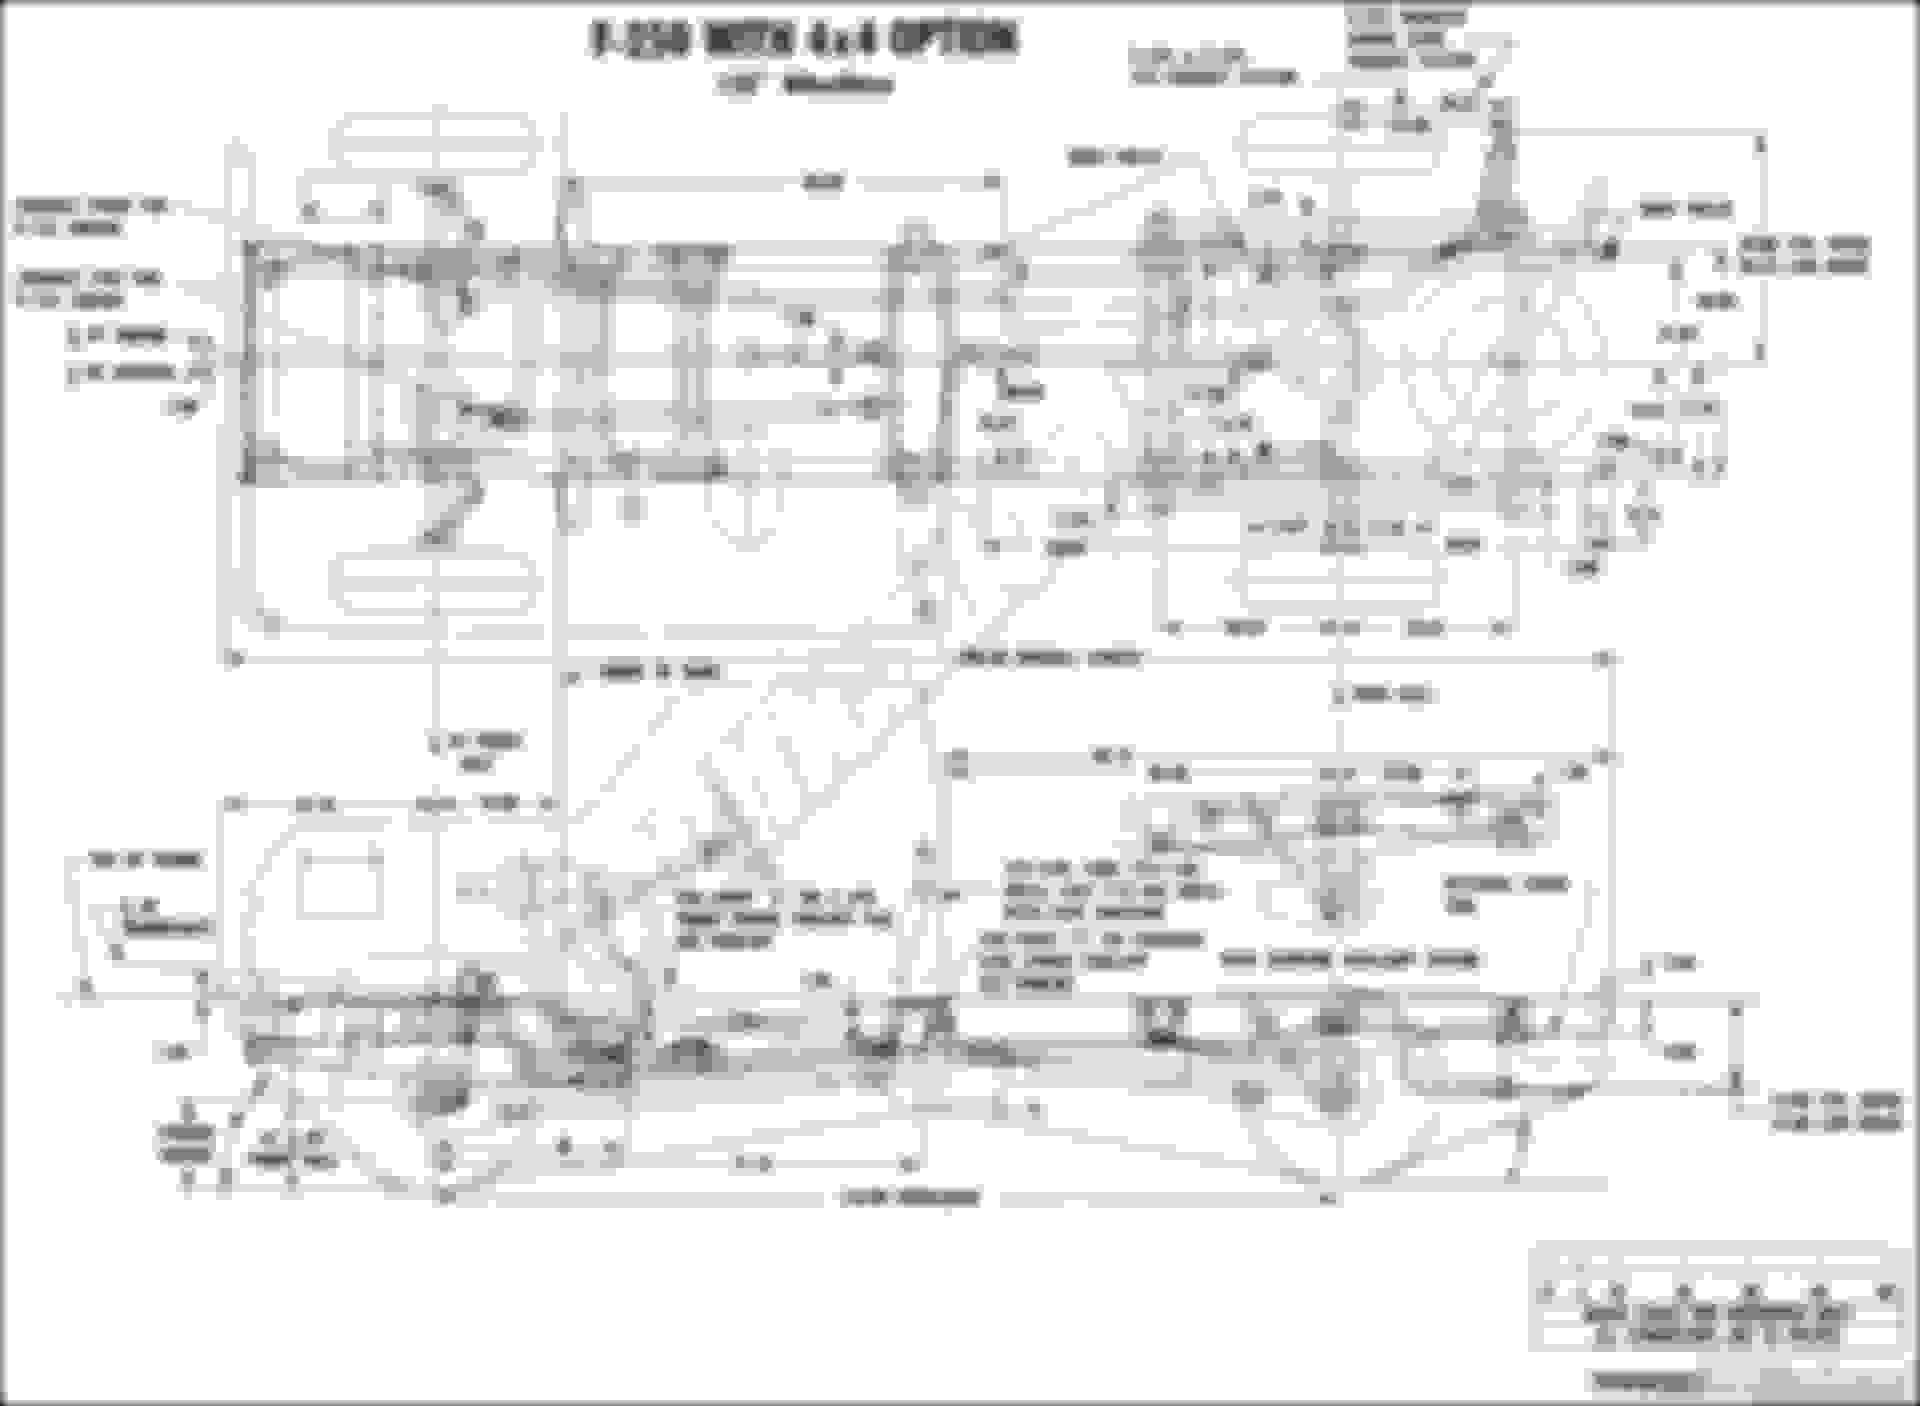 Bronco78IDI's 1978 Bronco IDI Turbo swap Fabrication (lots